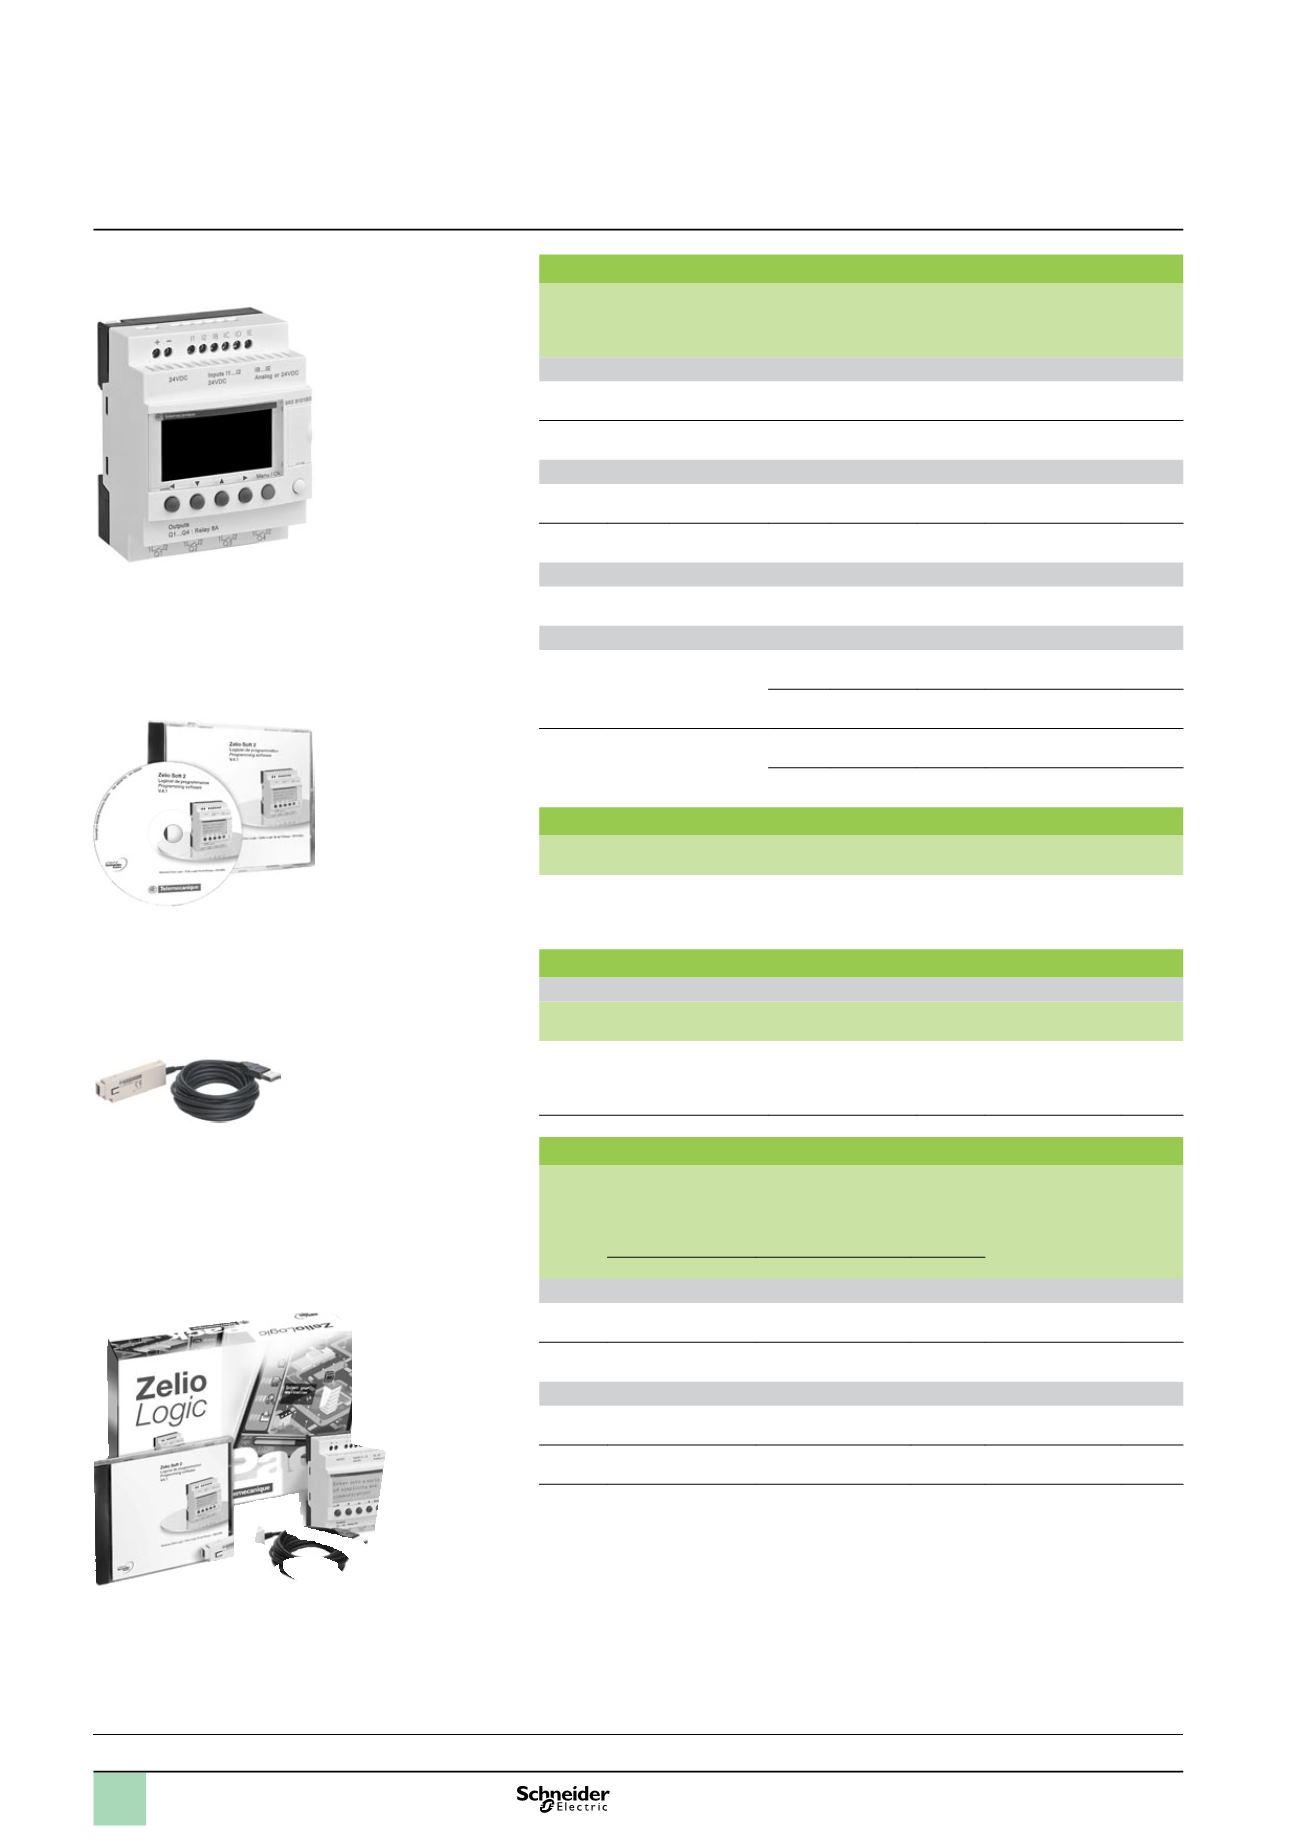 Miraculous Zelio Smart Relay Wiring Diagram Basic Electronics Wiring Diagram Wiring 101 Tzicihahutechinfo